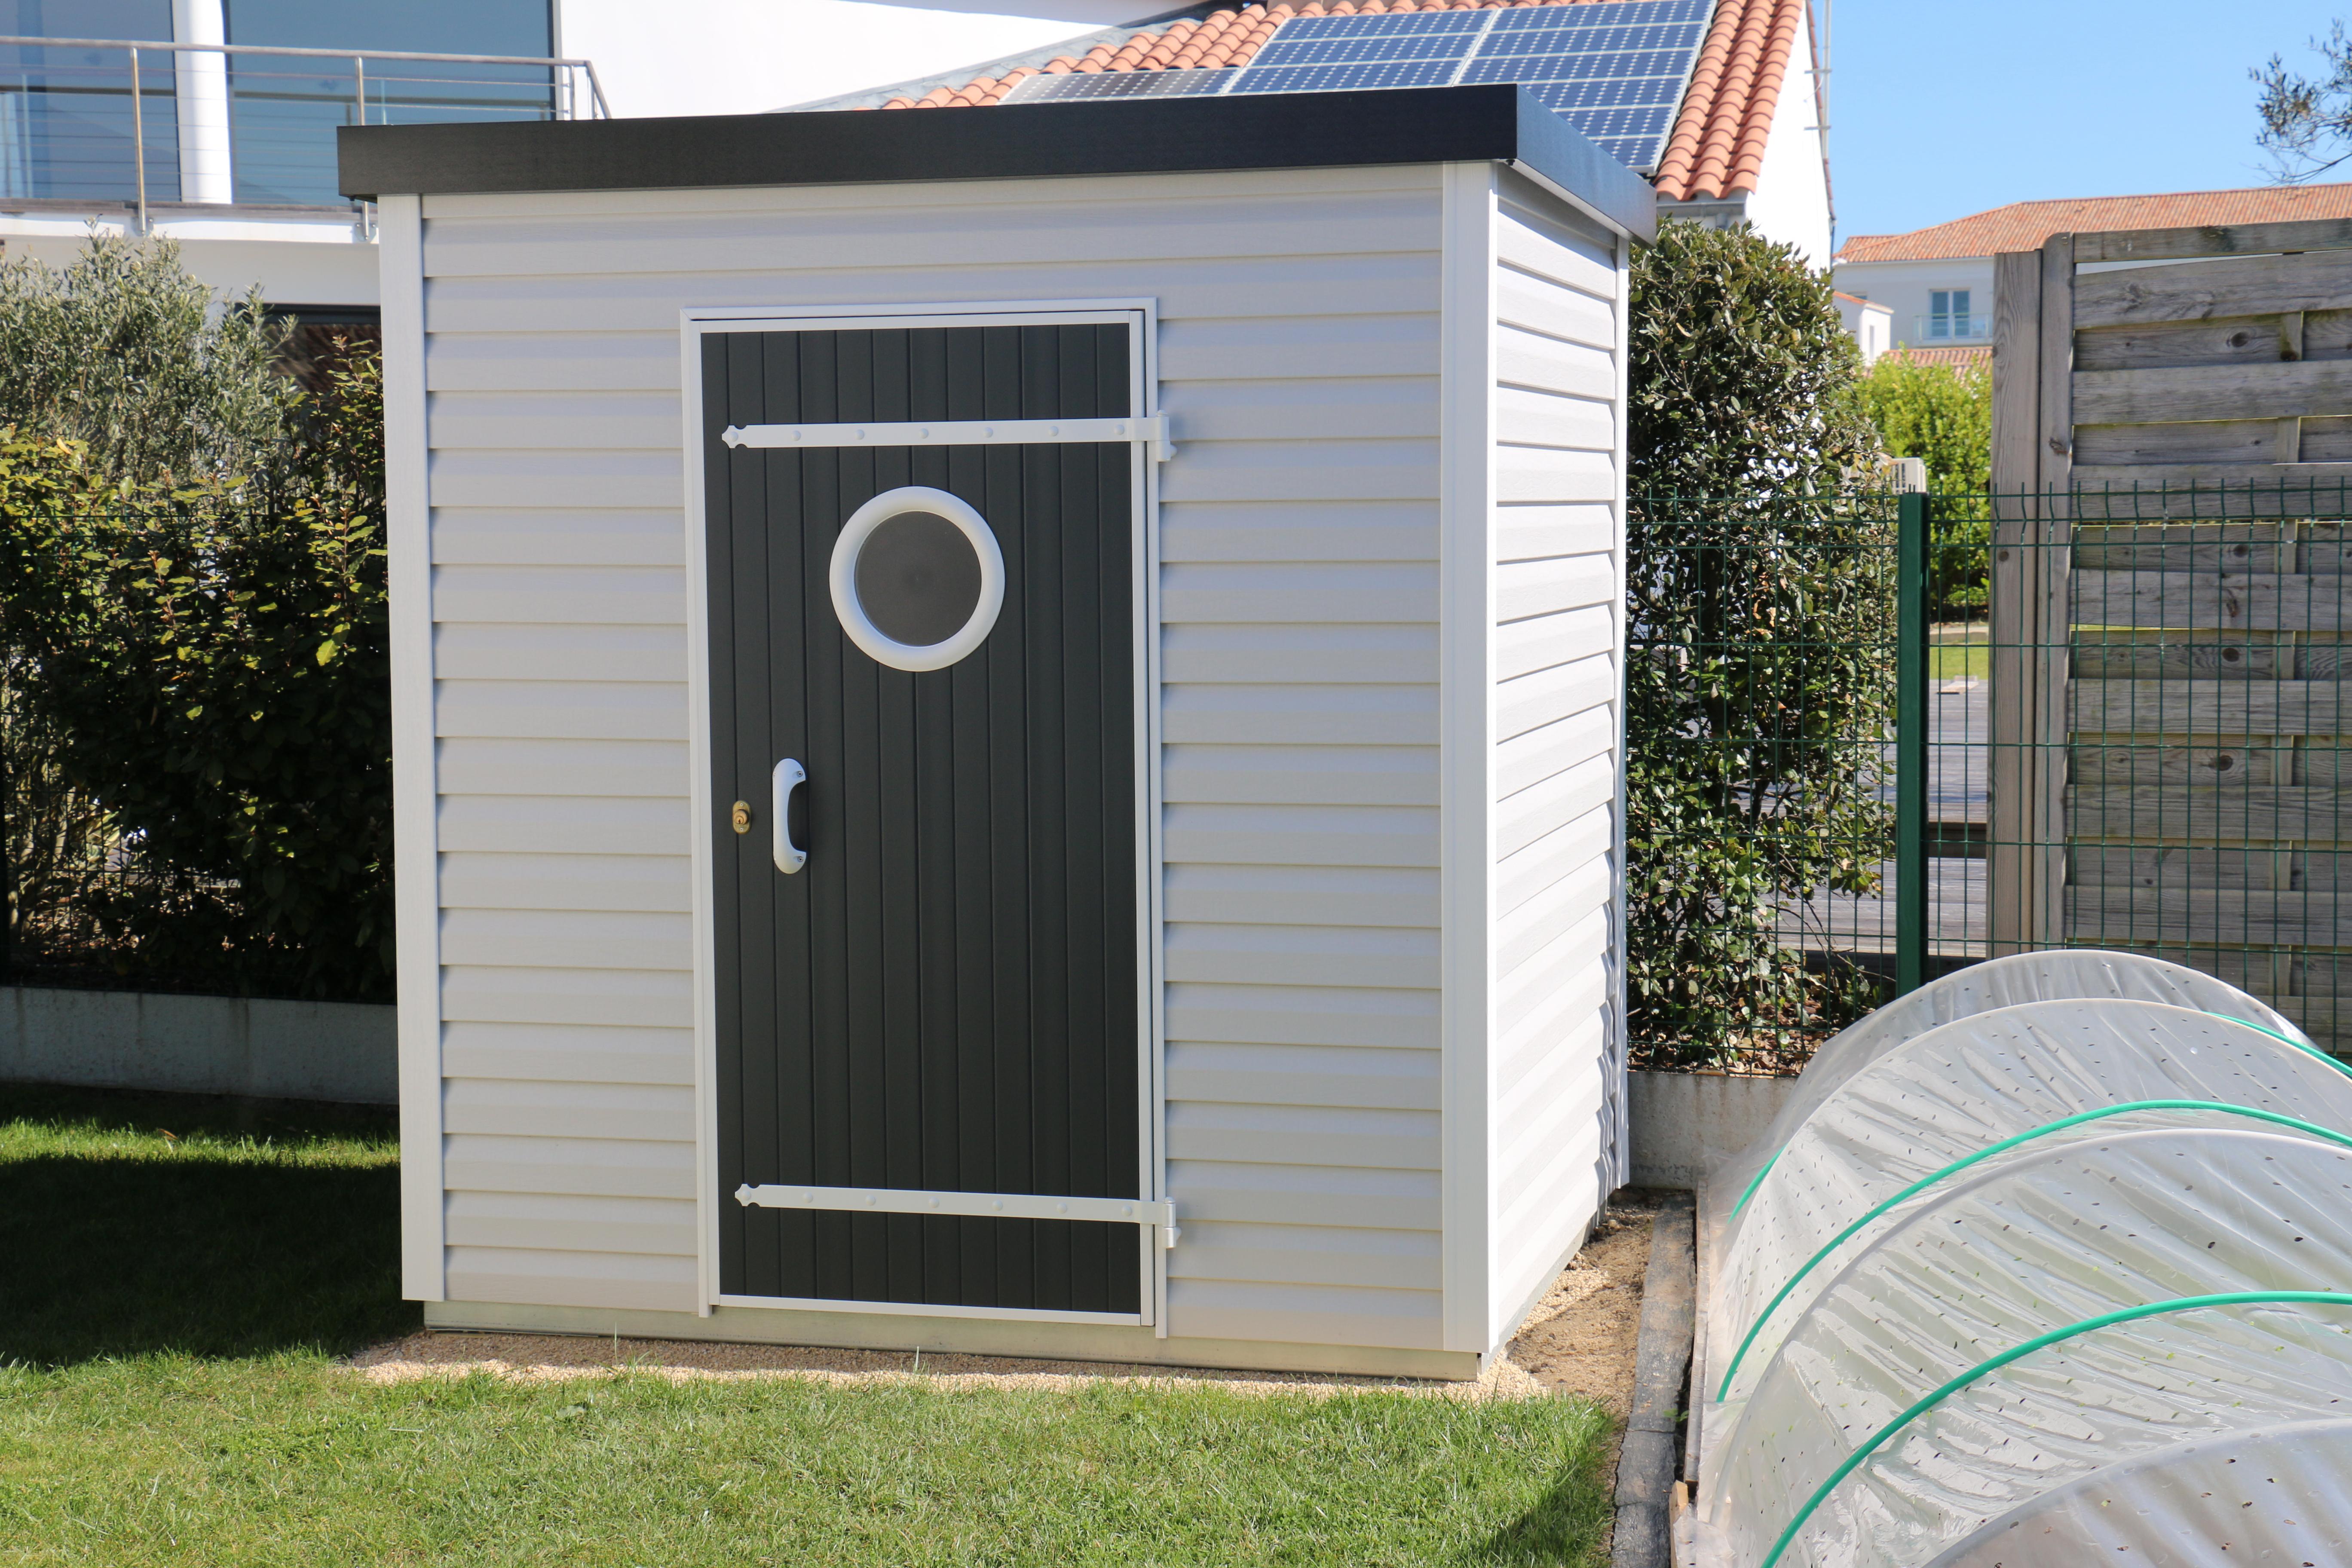 Abri De Jardin Design Toit Plat 3,72 M² - Abri Pvc < 10 M² Nea Concept à Abri De Jardin Design